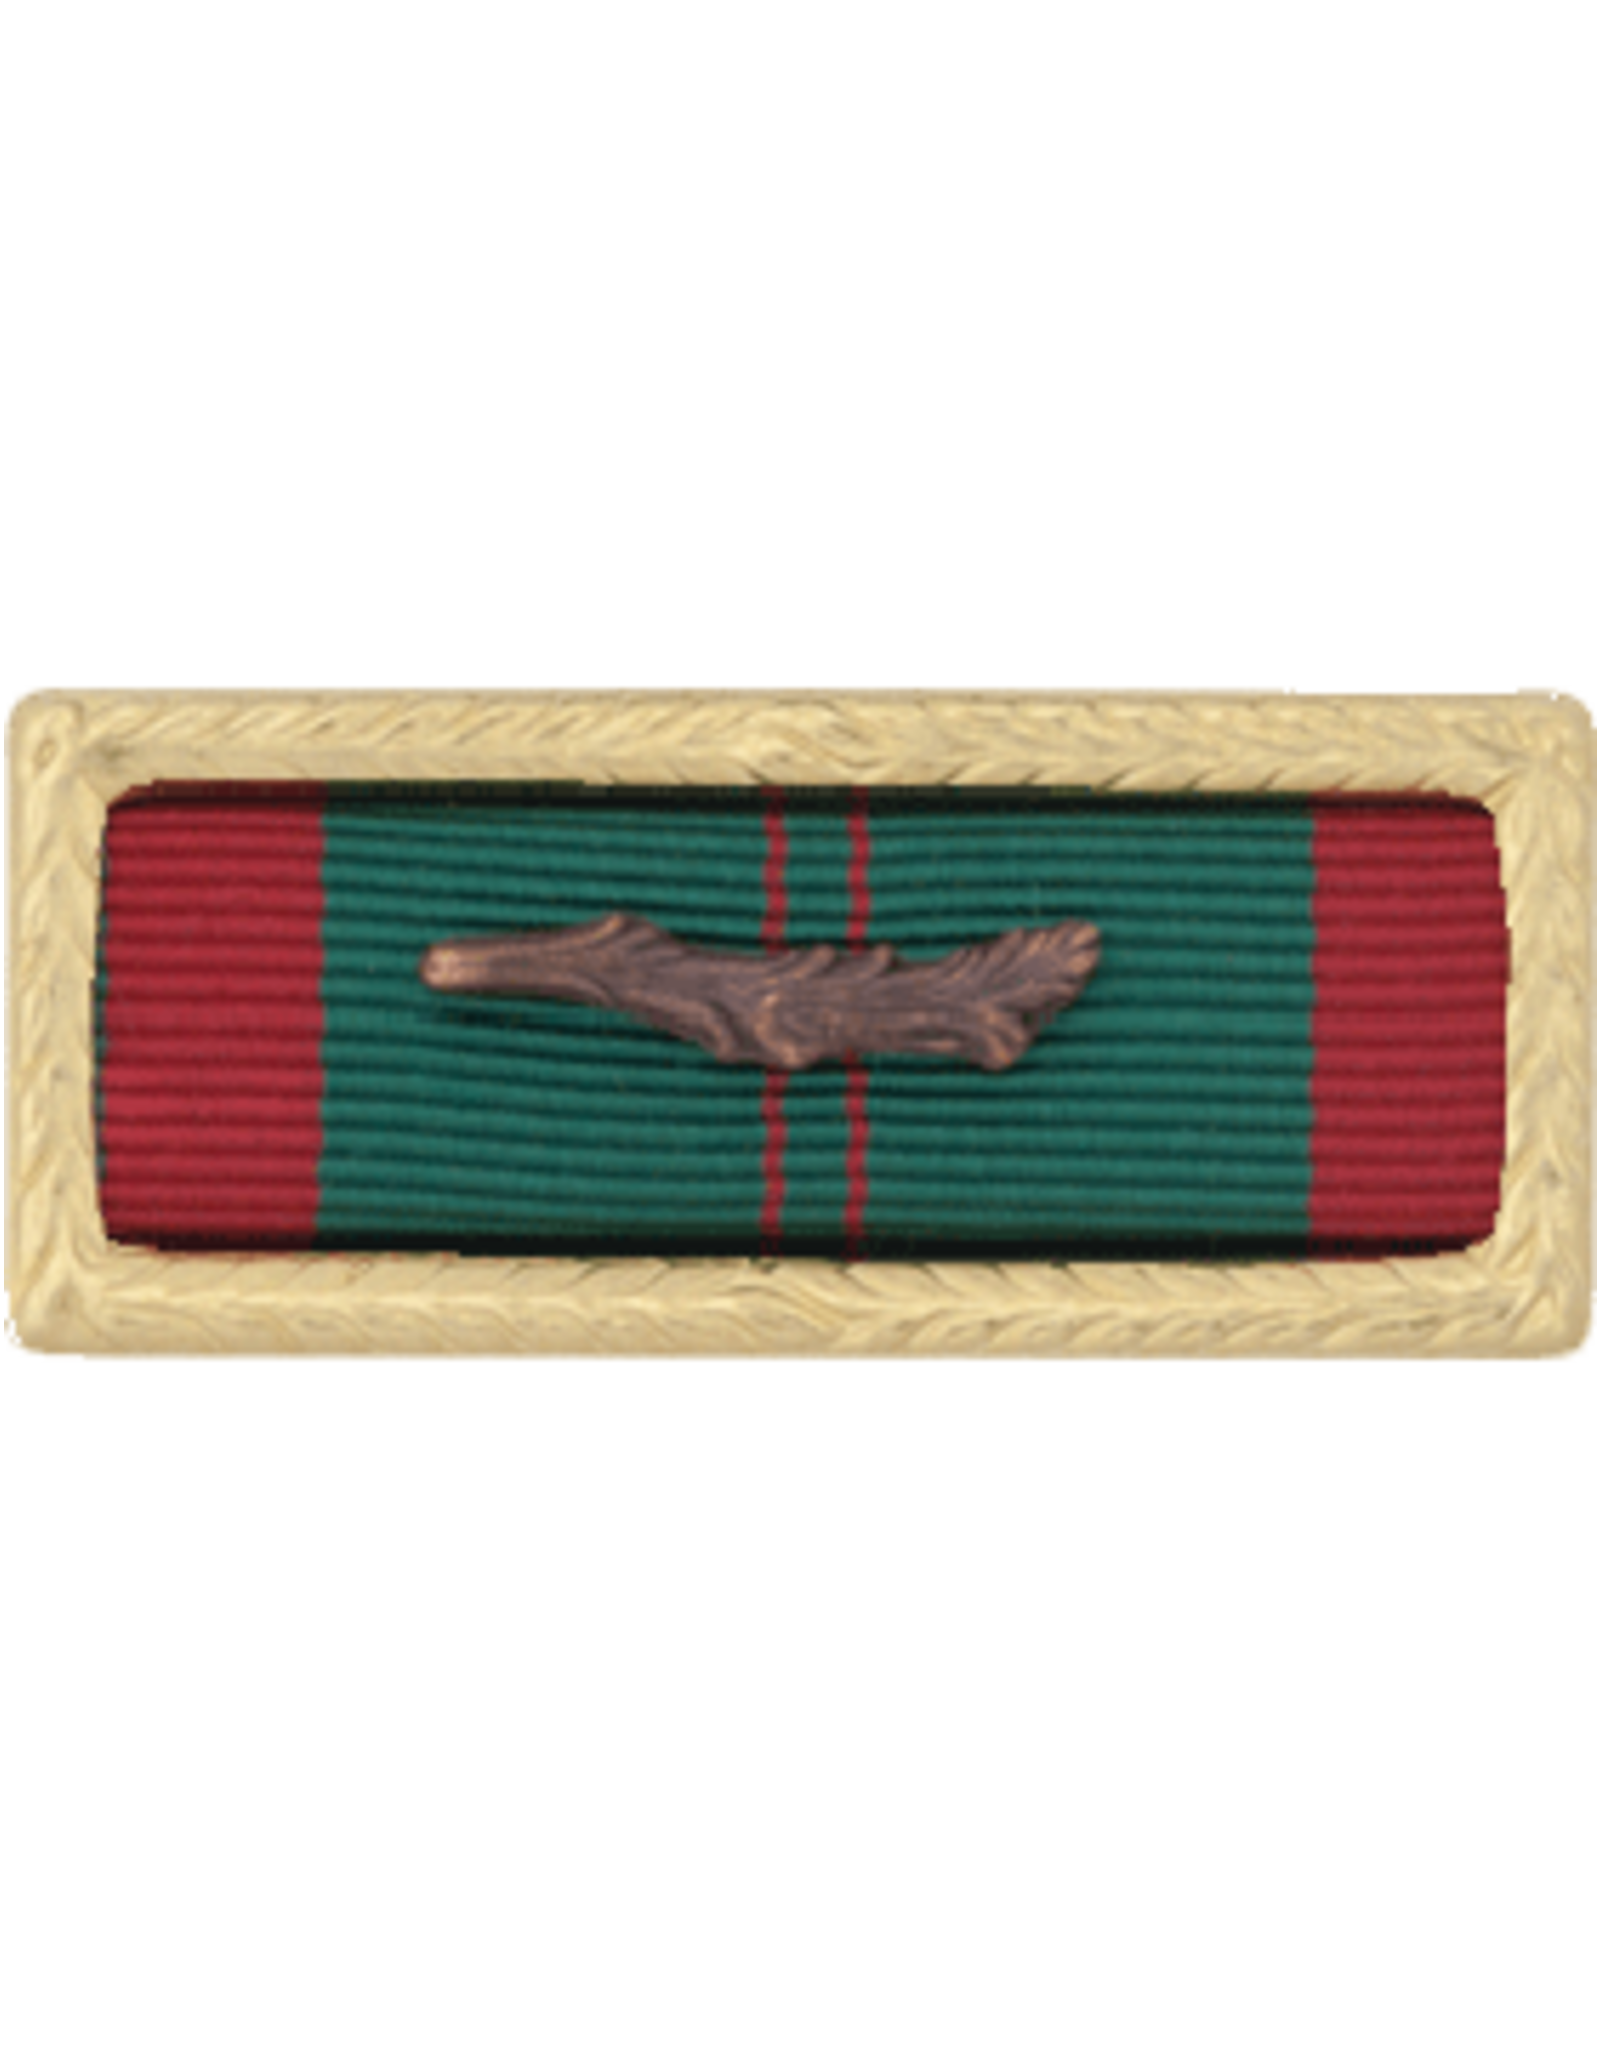 Vietnam Civil Action 1st Class Army Ribbon w/Frame